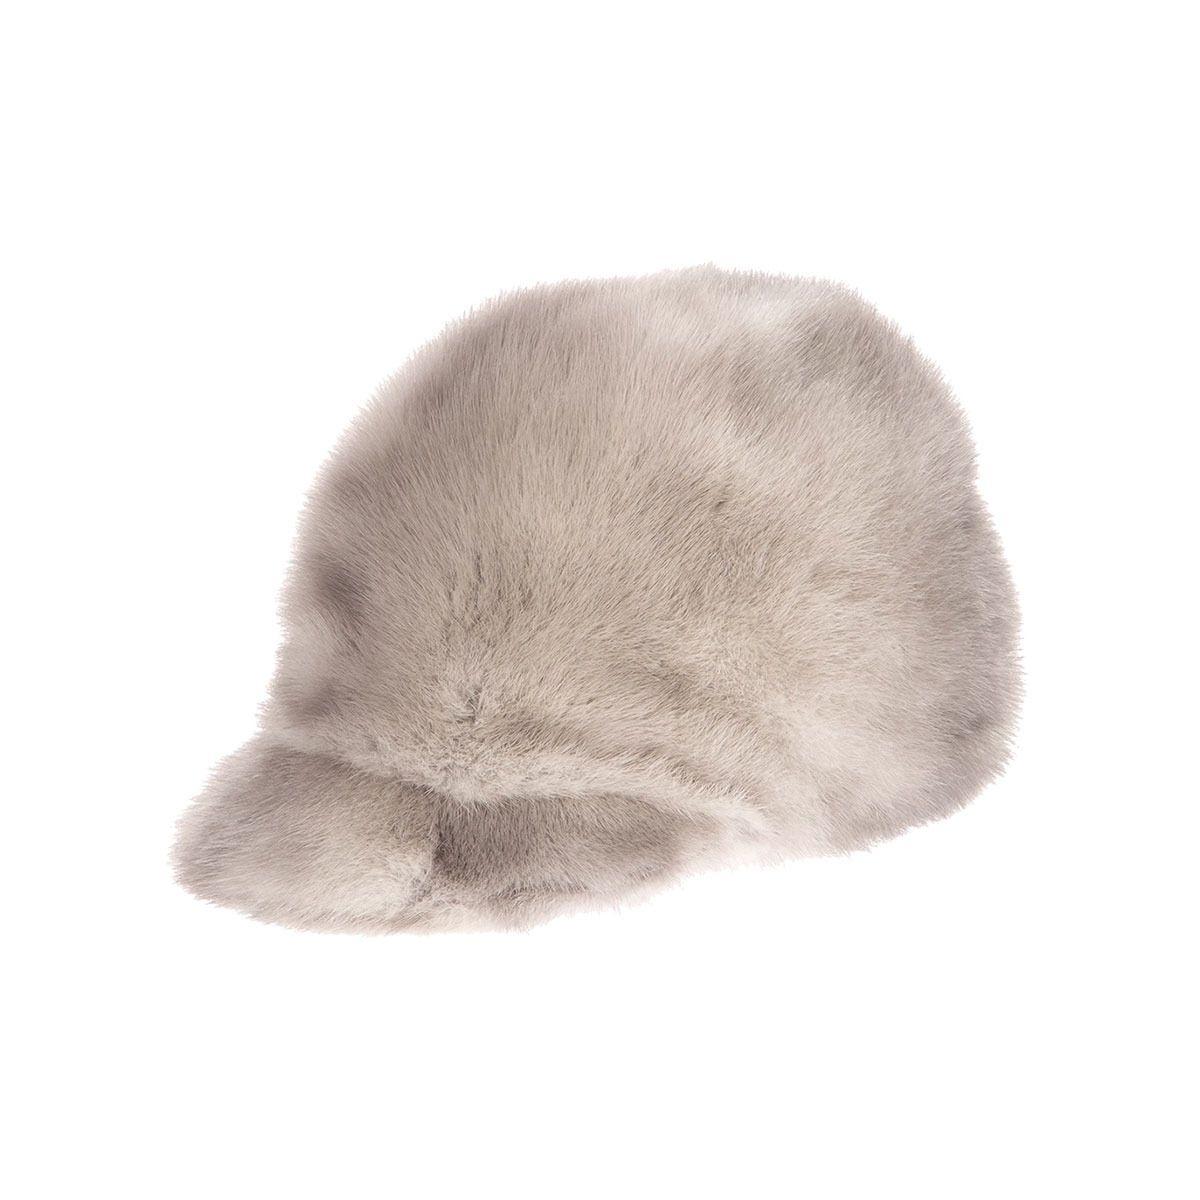 Muhlbauer Mink Fur Hat - The Cut